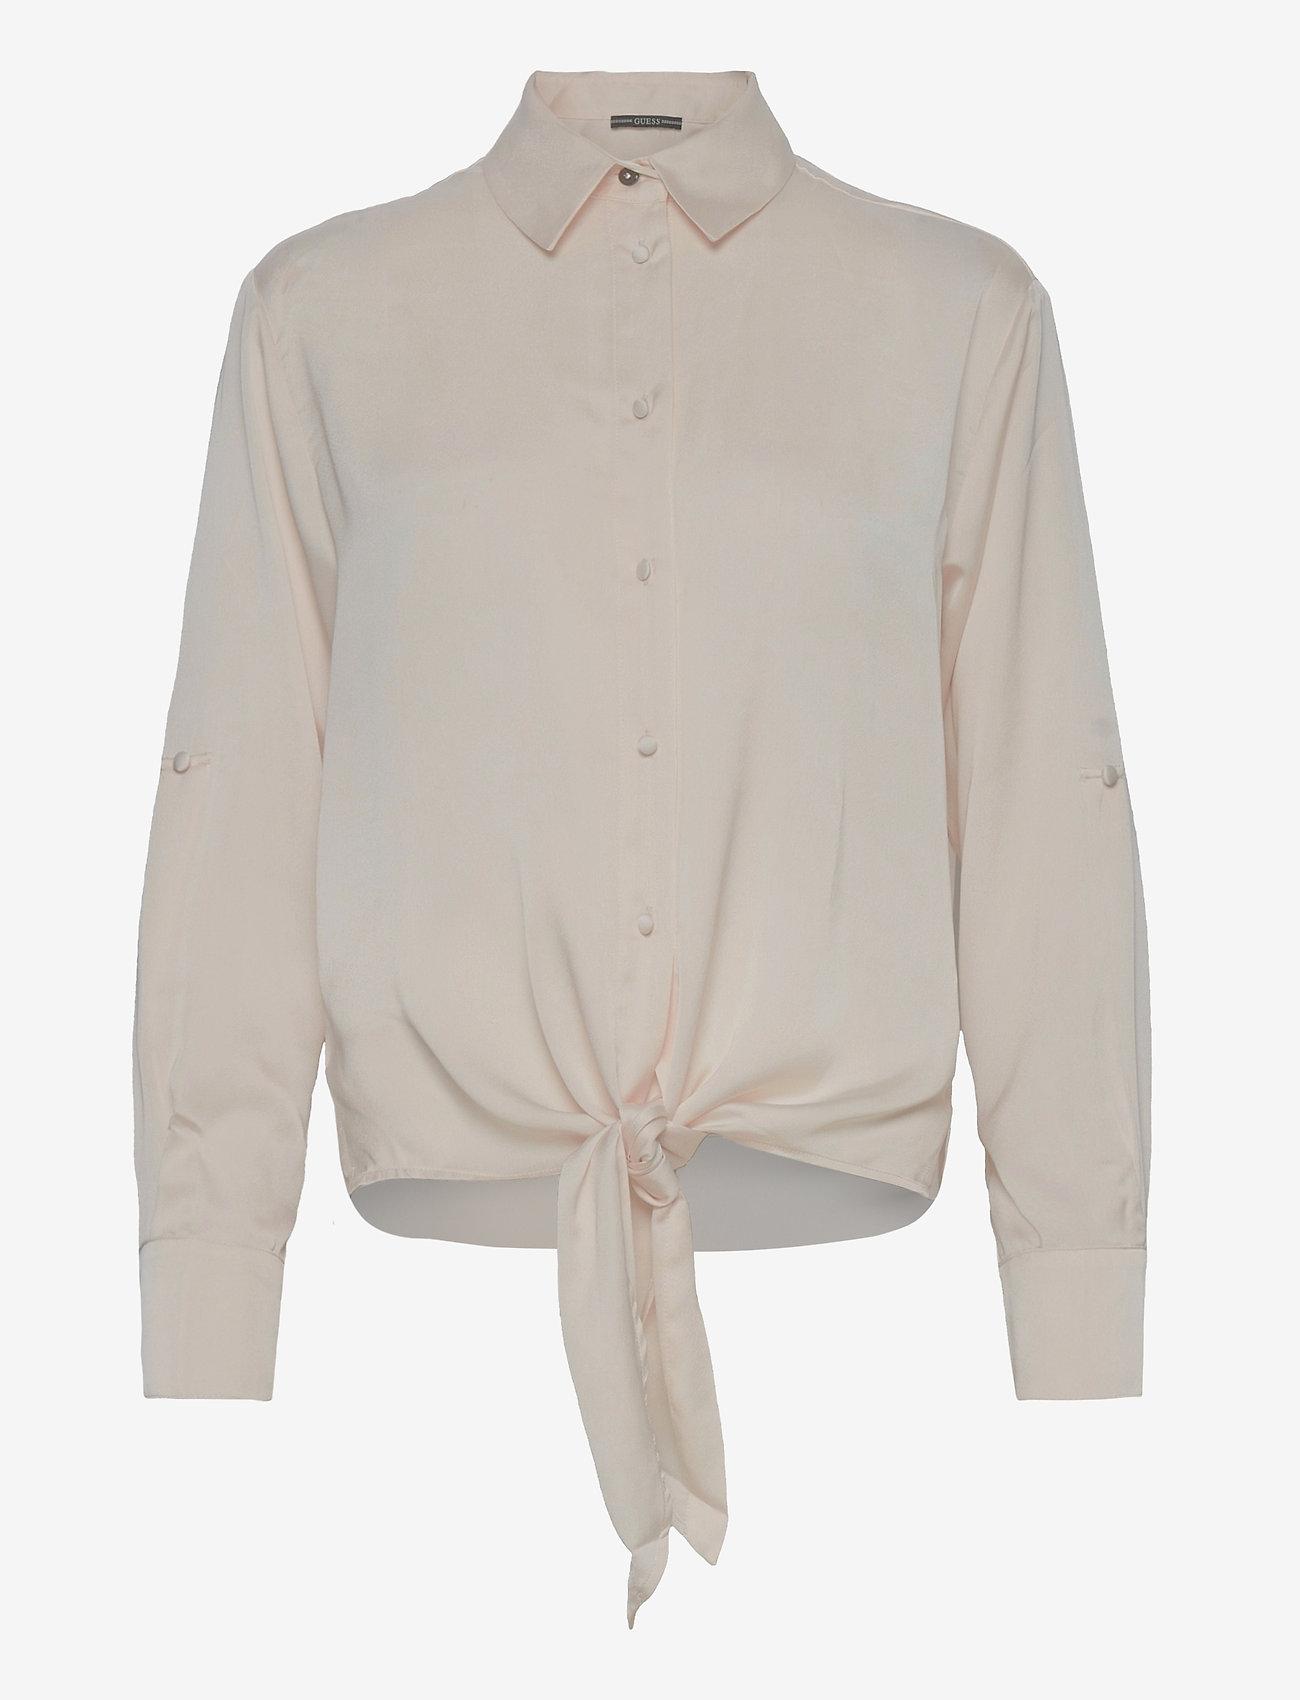 GUESS Jeans - LS AMANDA SHIRT - långärmade skjortor - cream white - 0